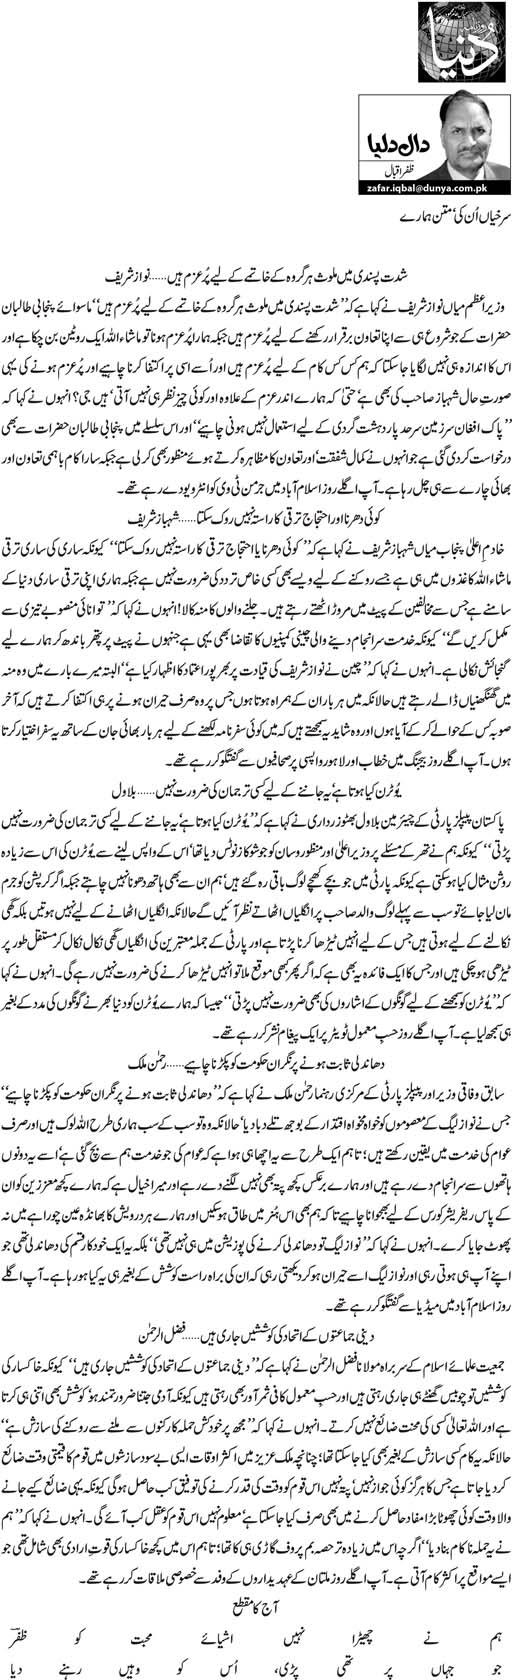 Zafar Iqbal